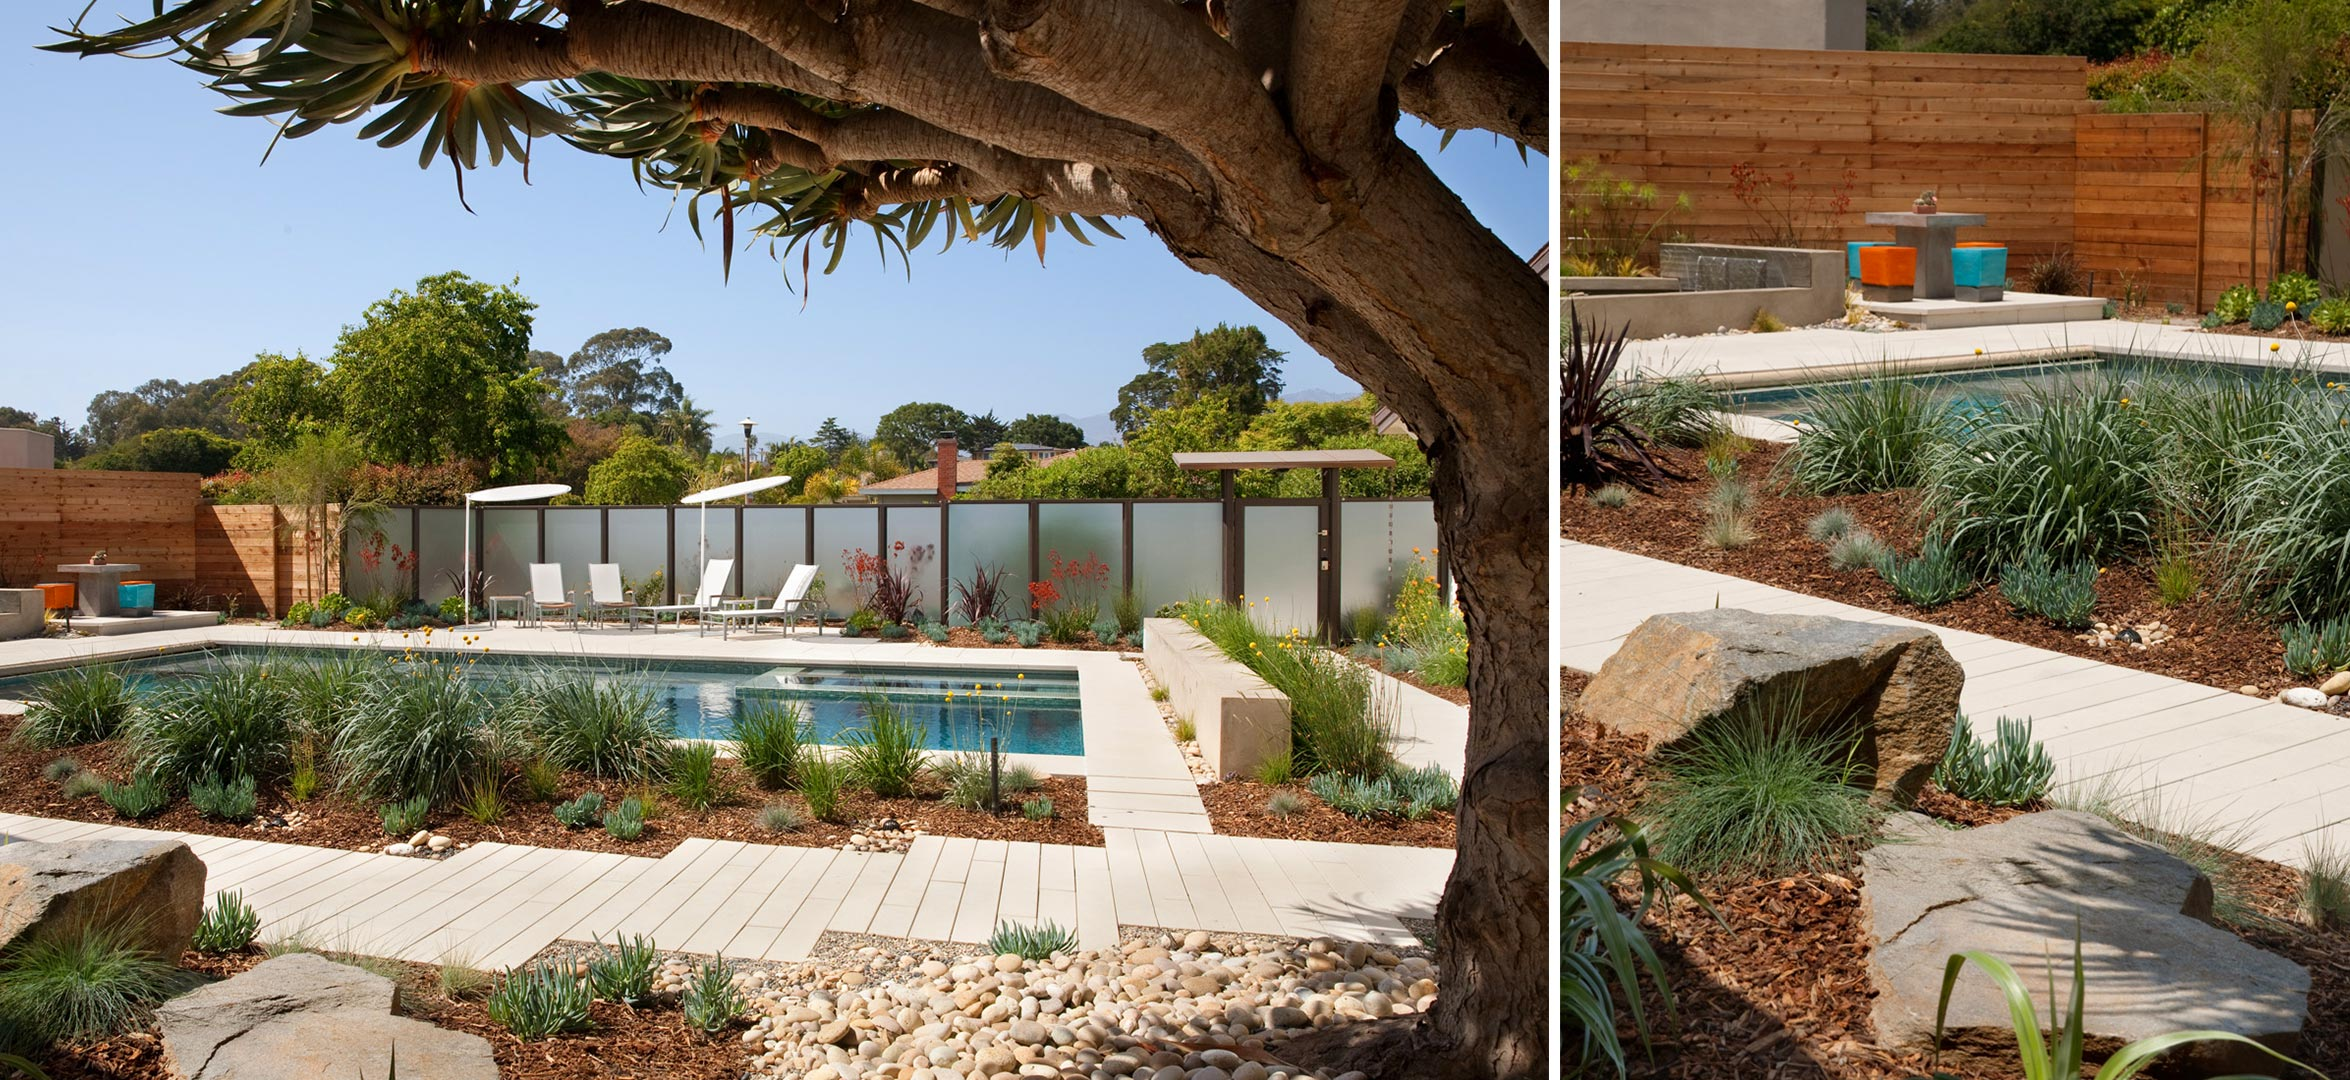 7-pool-concrete-pavers.jpg